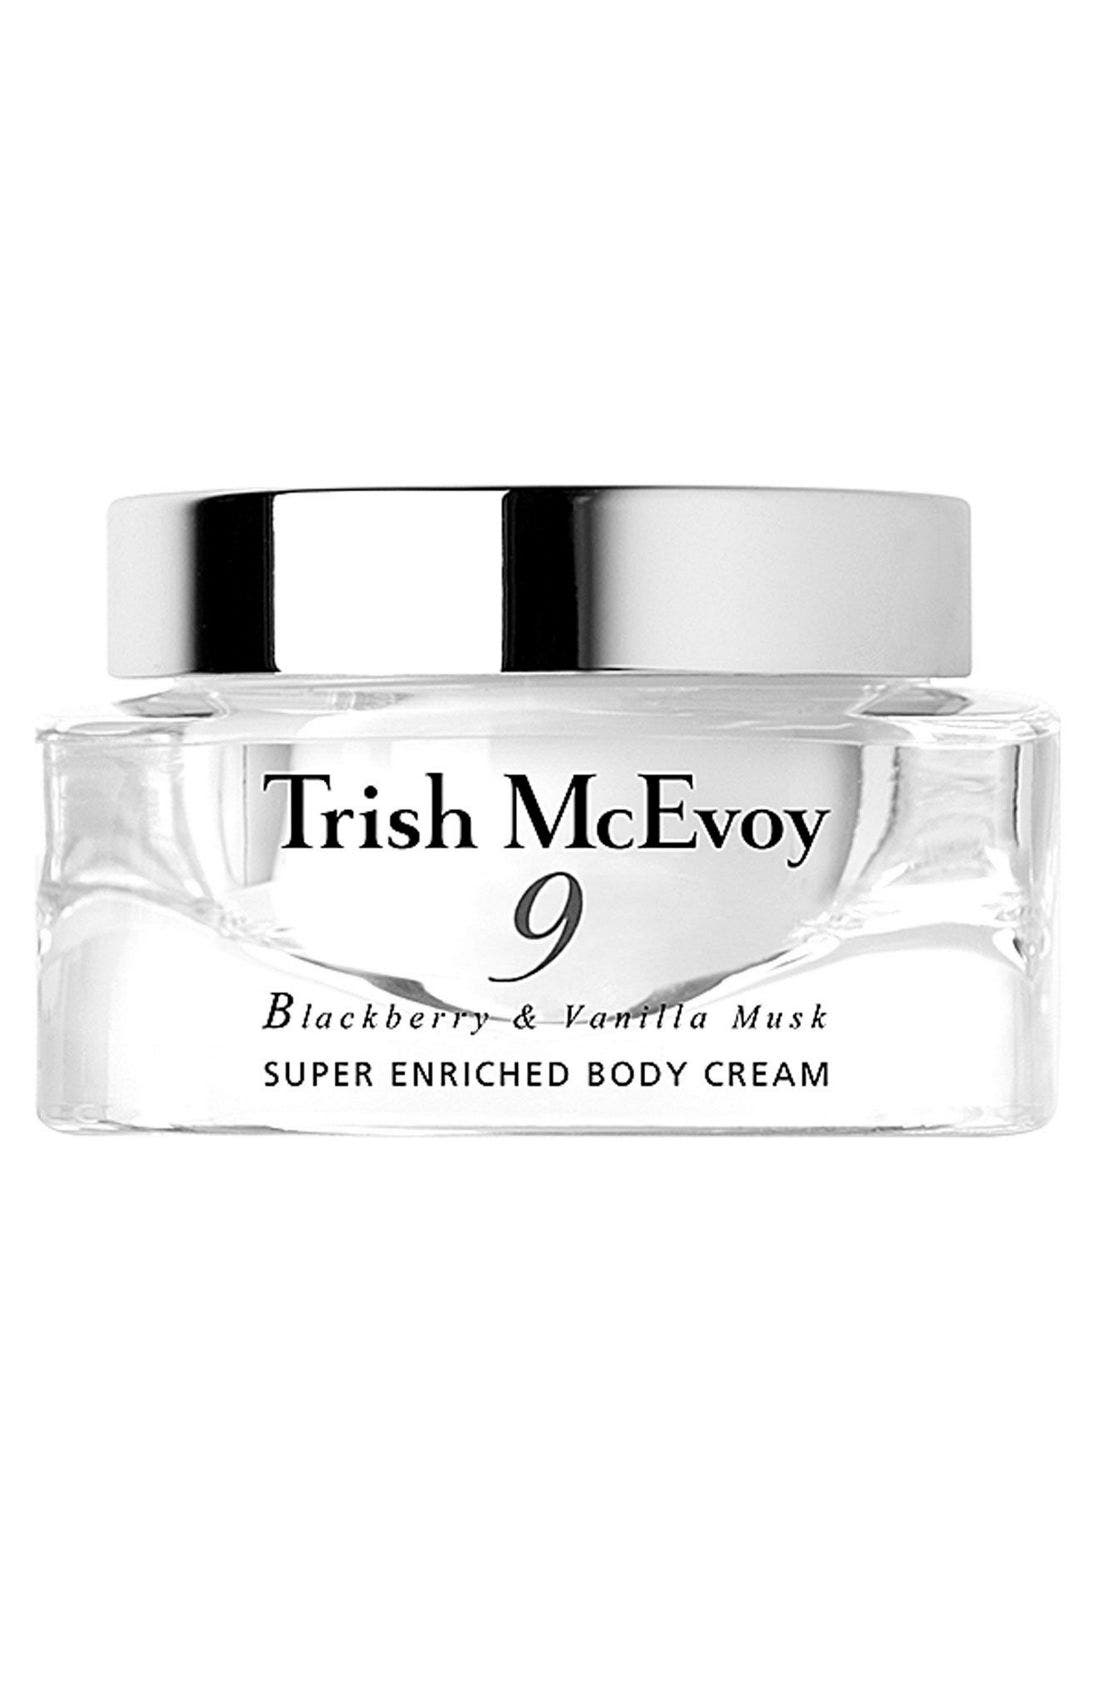 TRISH MCEVOY, No. 9 Blackberry & Vanilla Musk Super Enriched Body Cream, Main thumbnail 1, color, 000